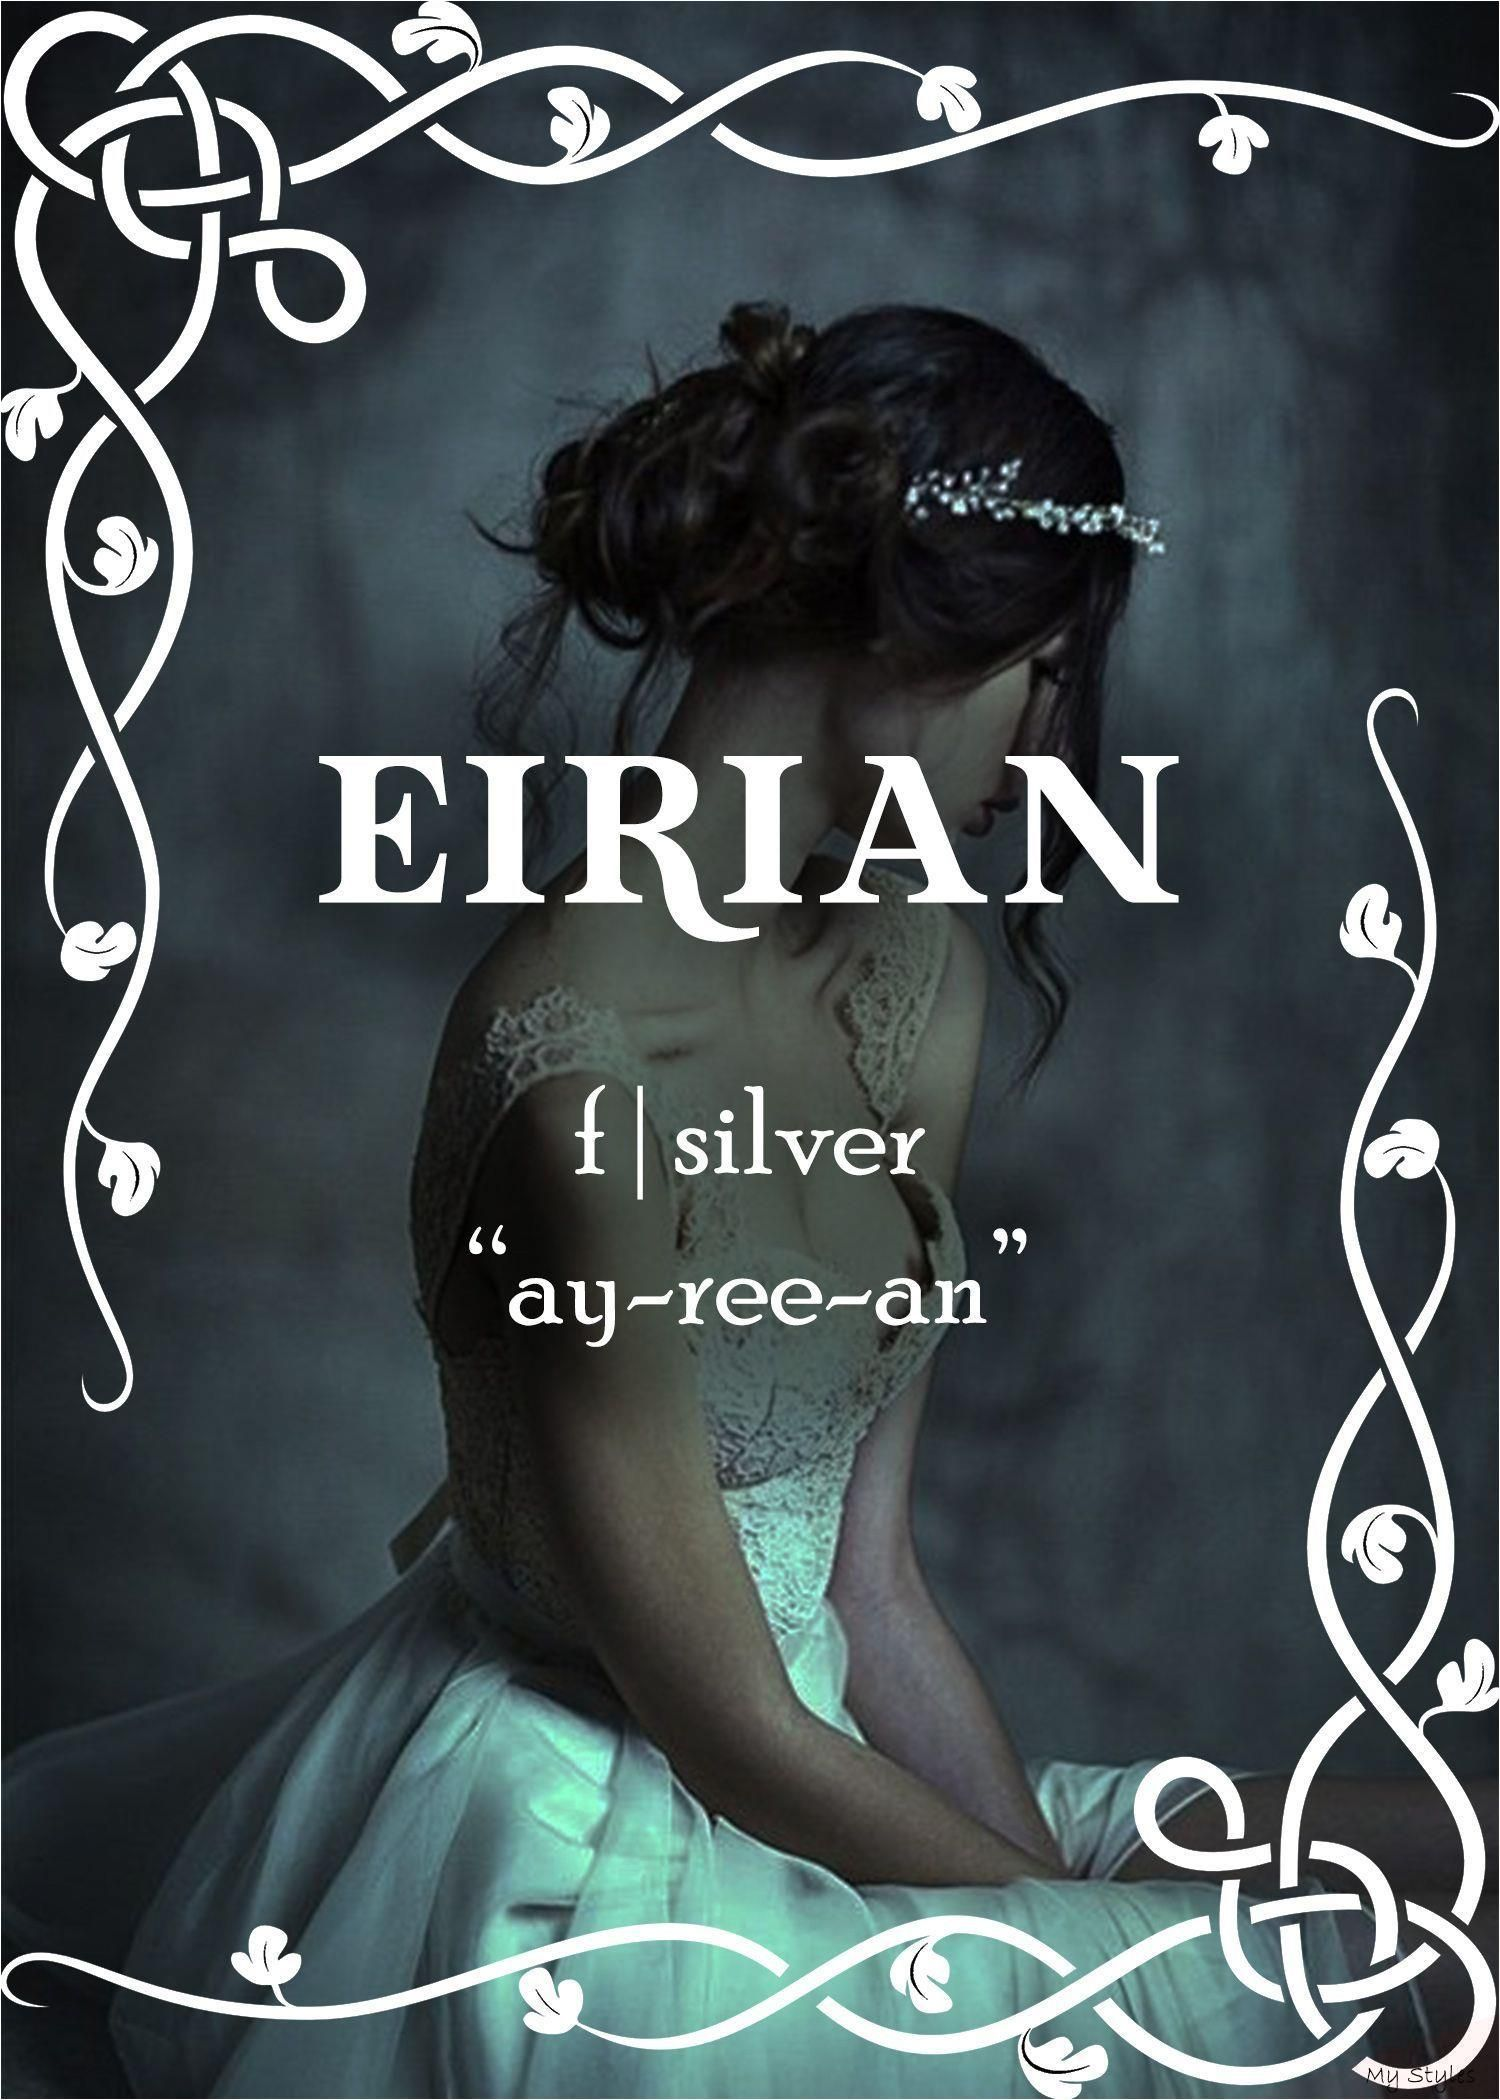 Weiblicher Fantasiename: Eirian # eirian #Fantasie #